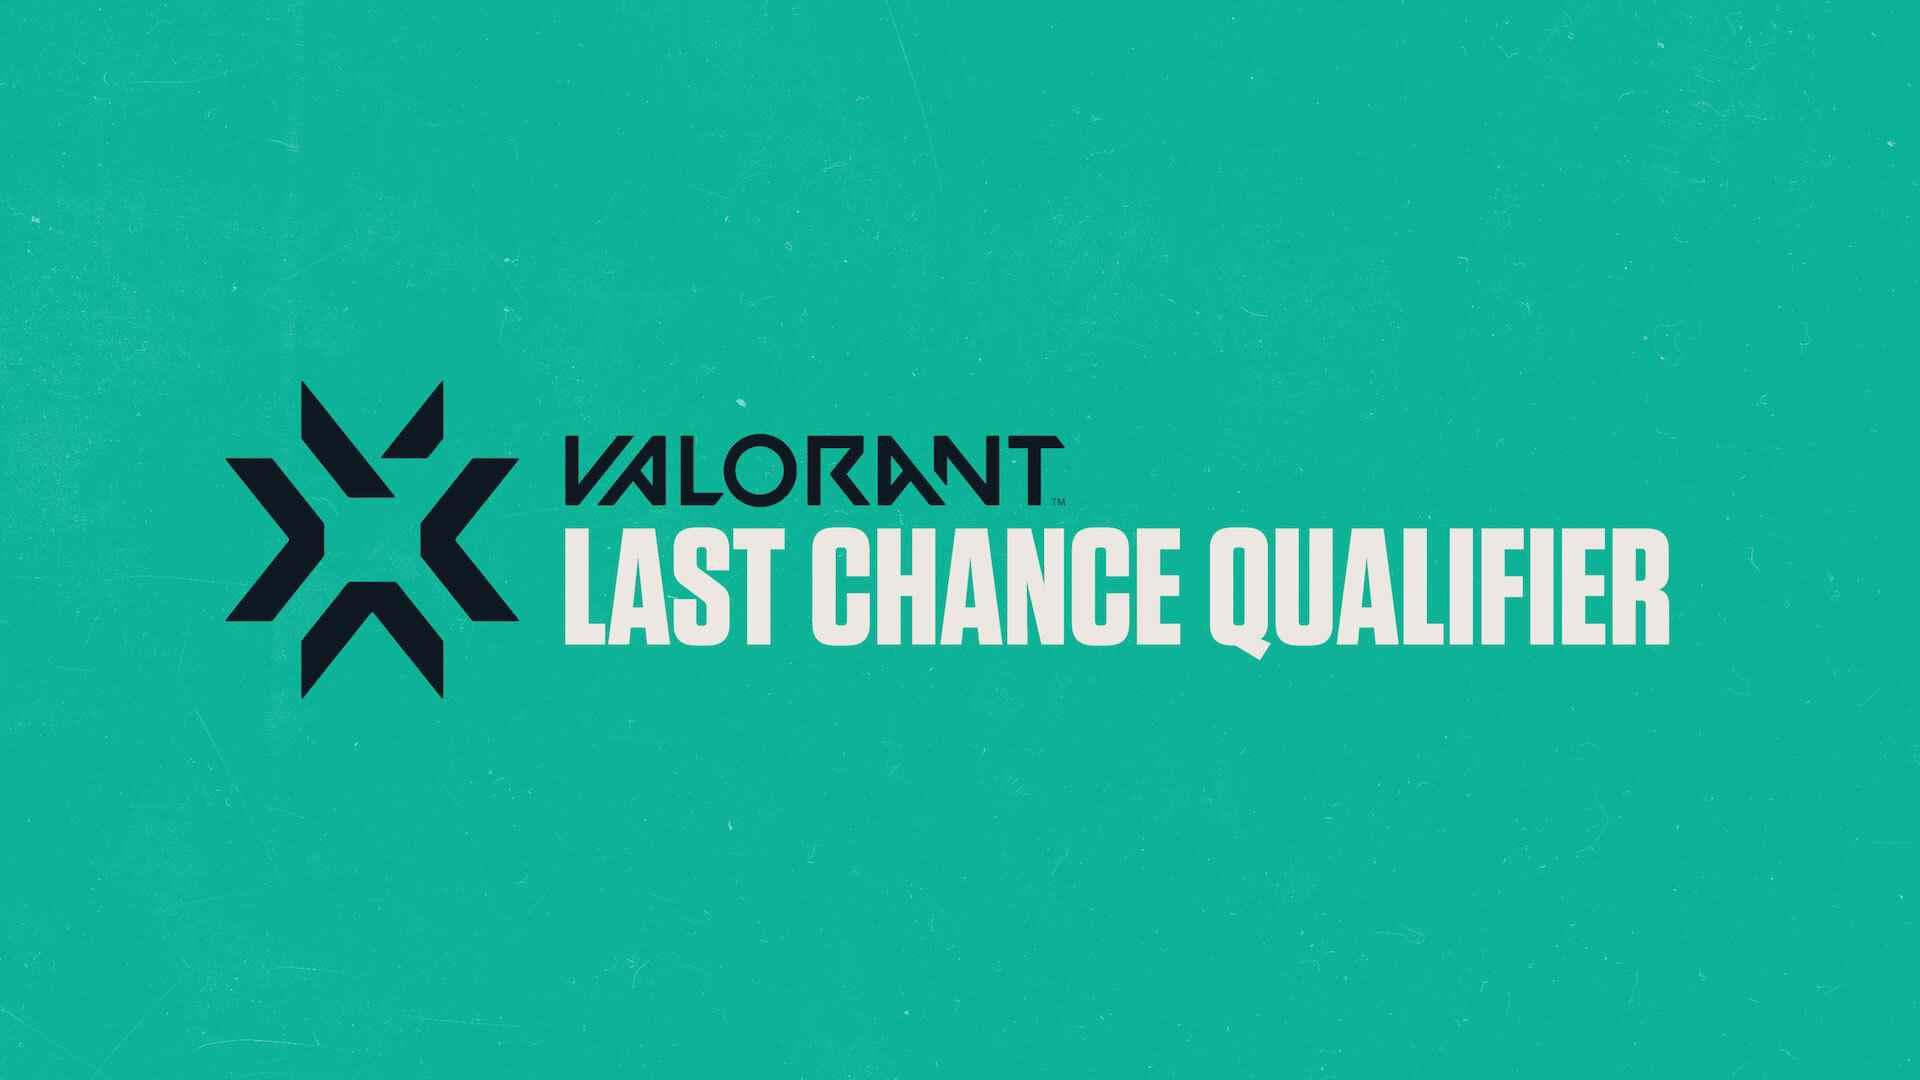 Oceanian Teams Last Chance Qualifiers